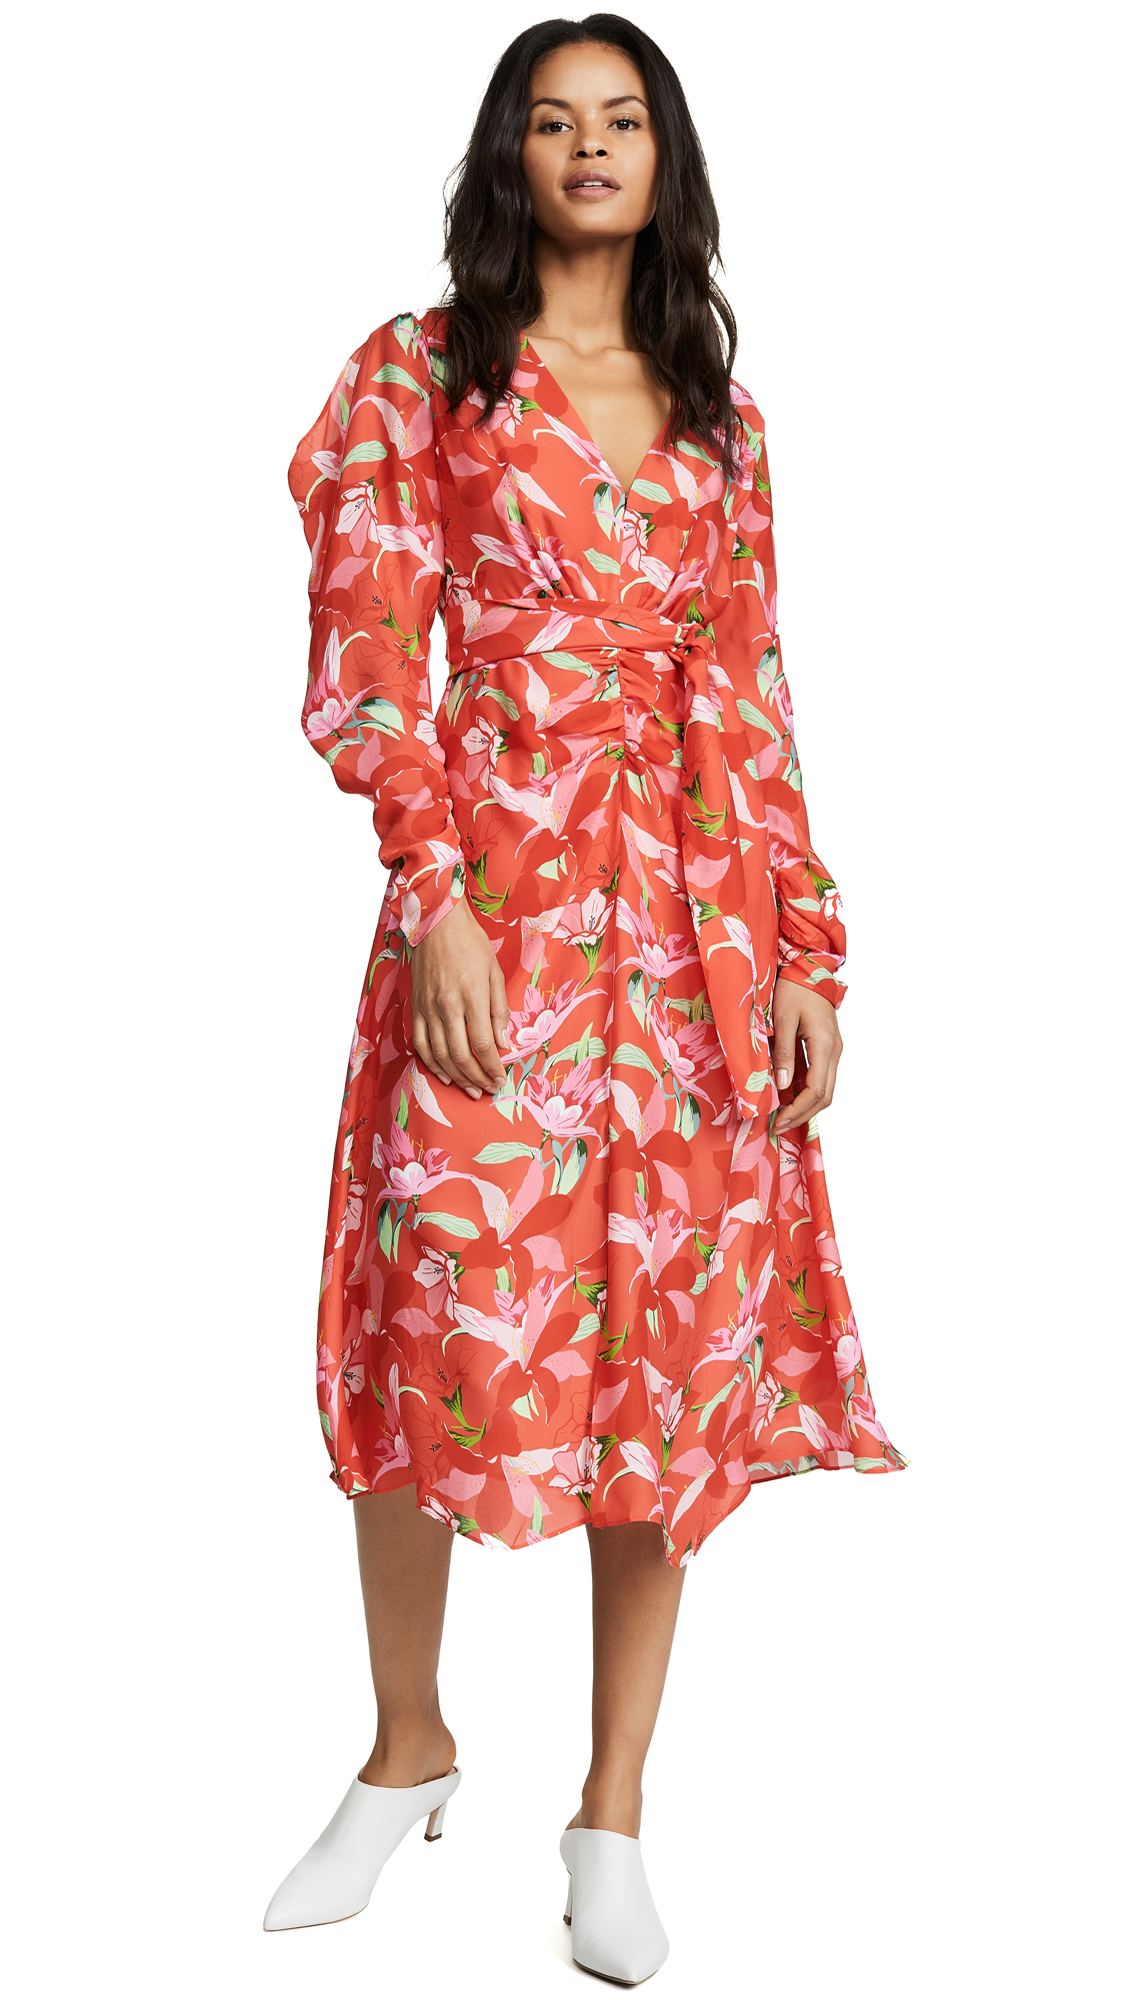 La Maison Talulah Daiquiri Midi Dress - Strawberry Daiquiri